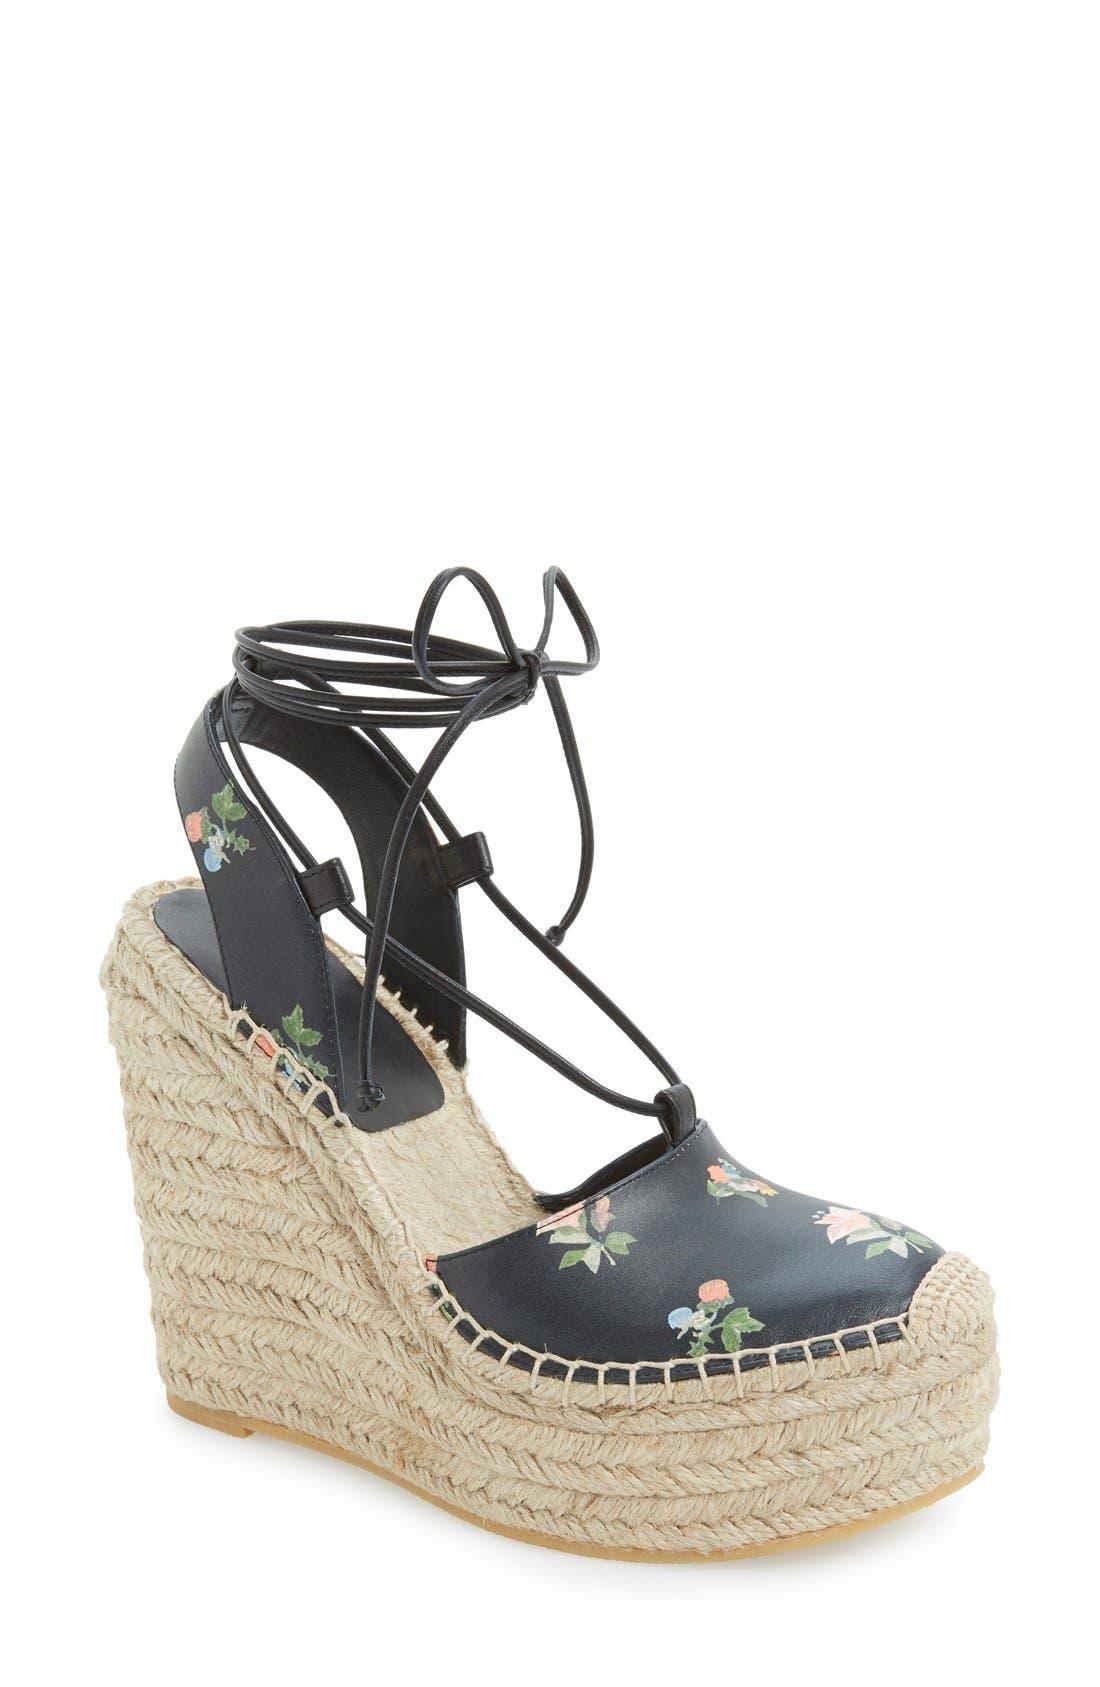 Alternate Image 1 Selected - Saint Laurent Espadrille Wedge Sandal (Women)